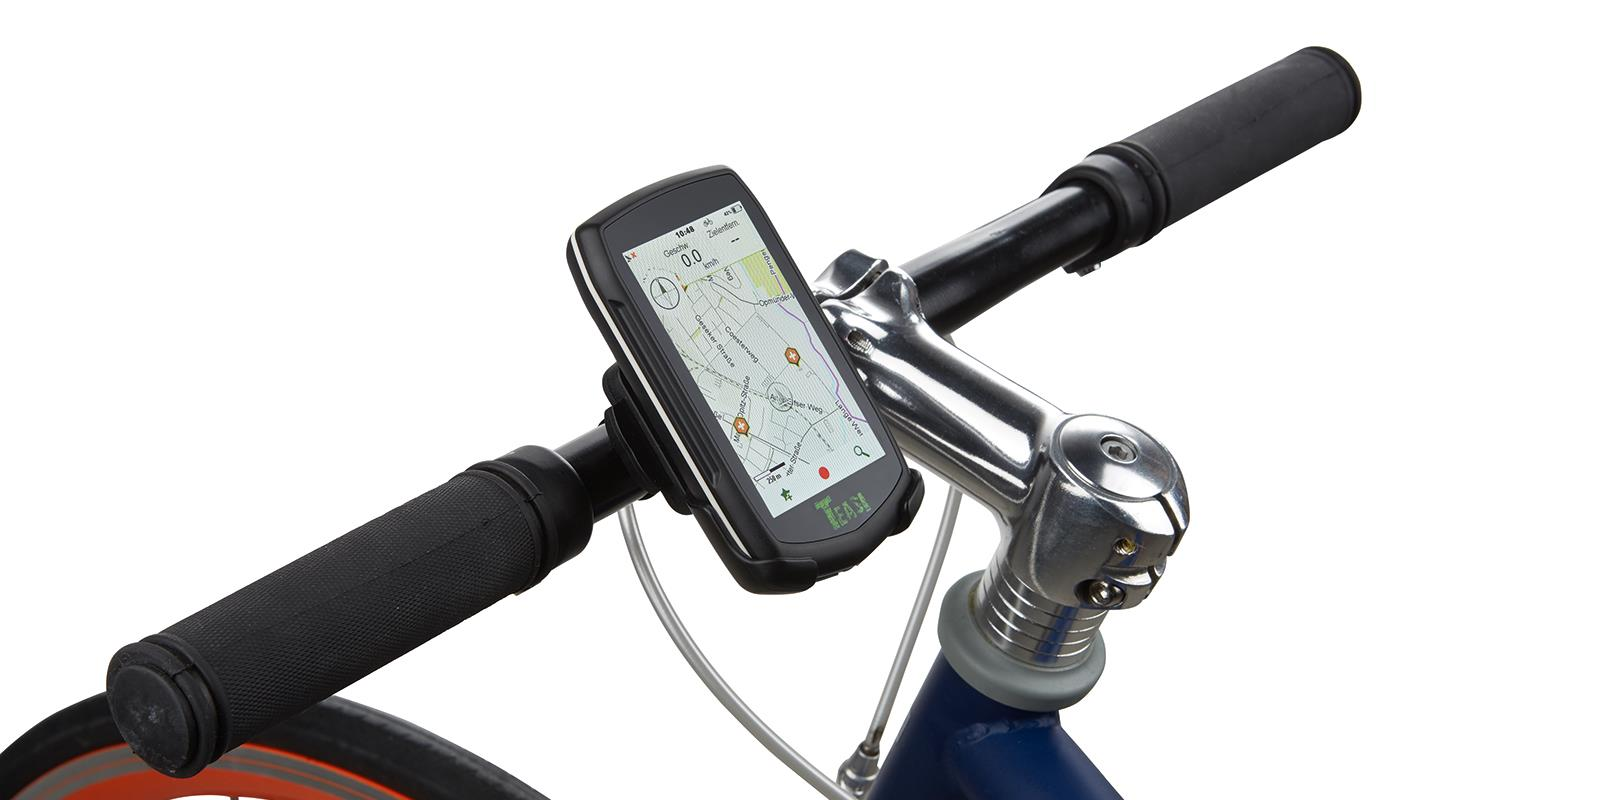 fahrrad navigationsger t teasi one rad wandern ski boot. Black Bedroom Furniture Sets. Home Design Ideas